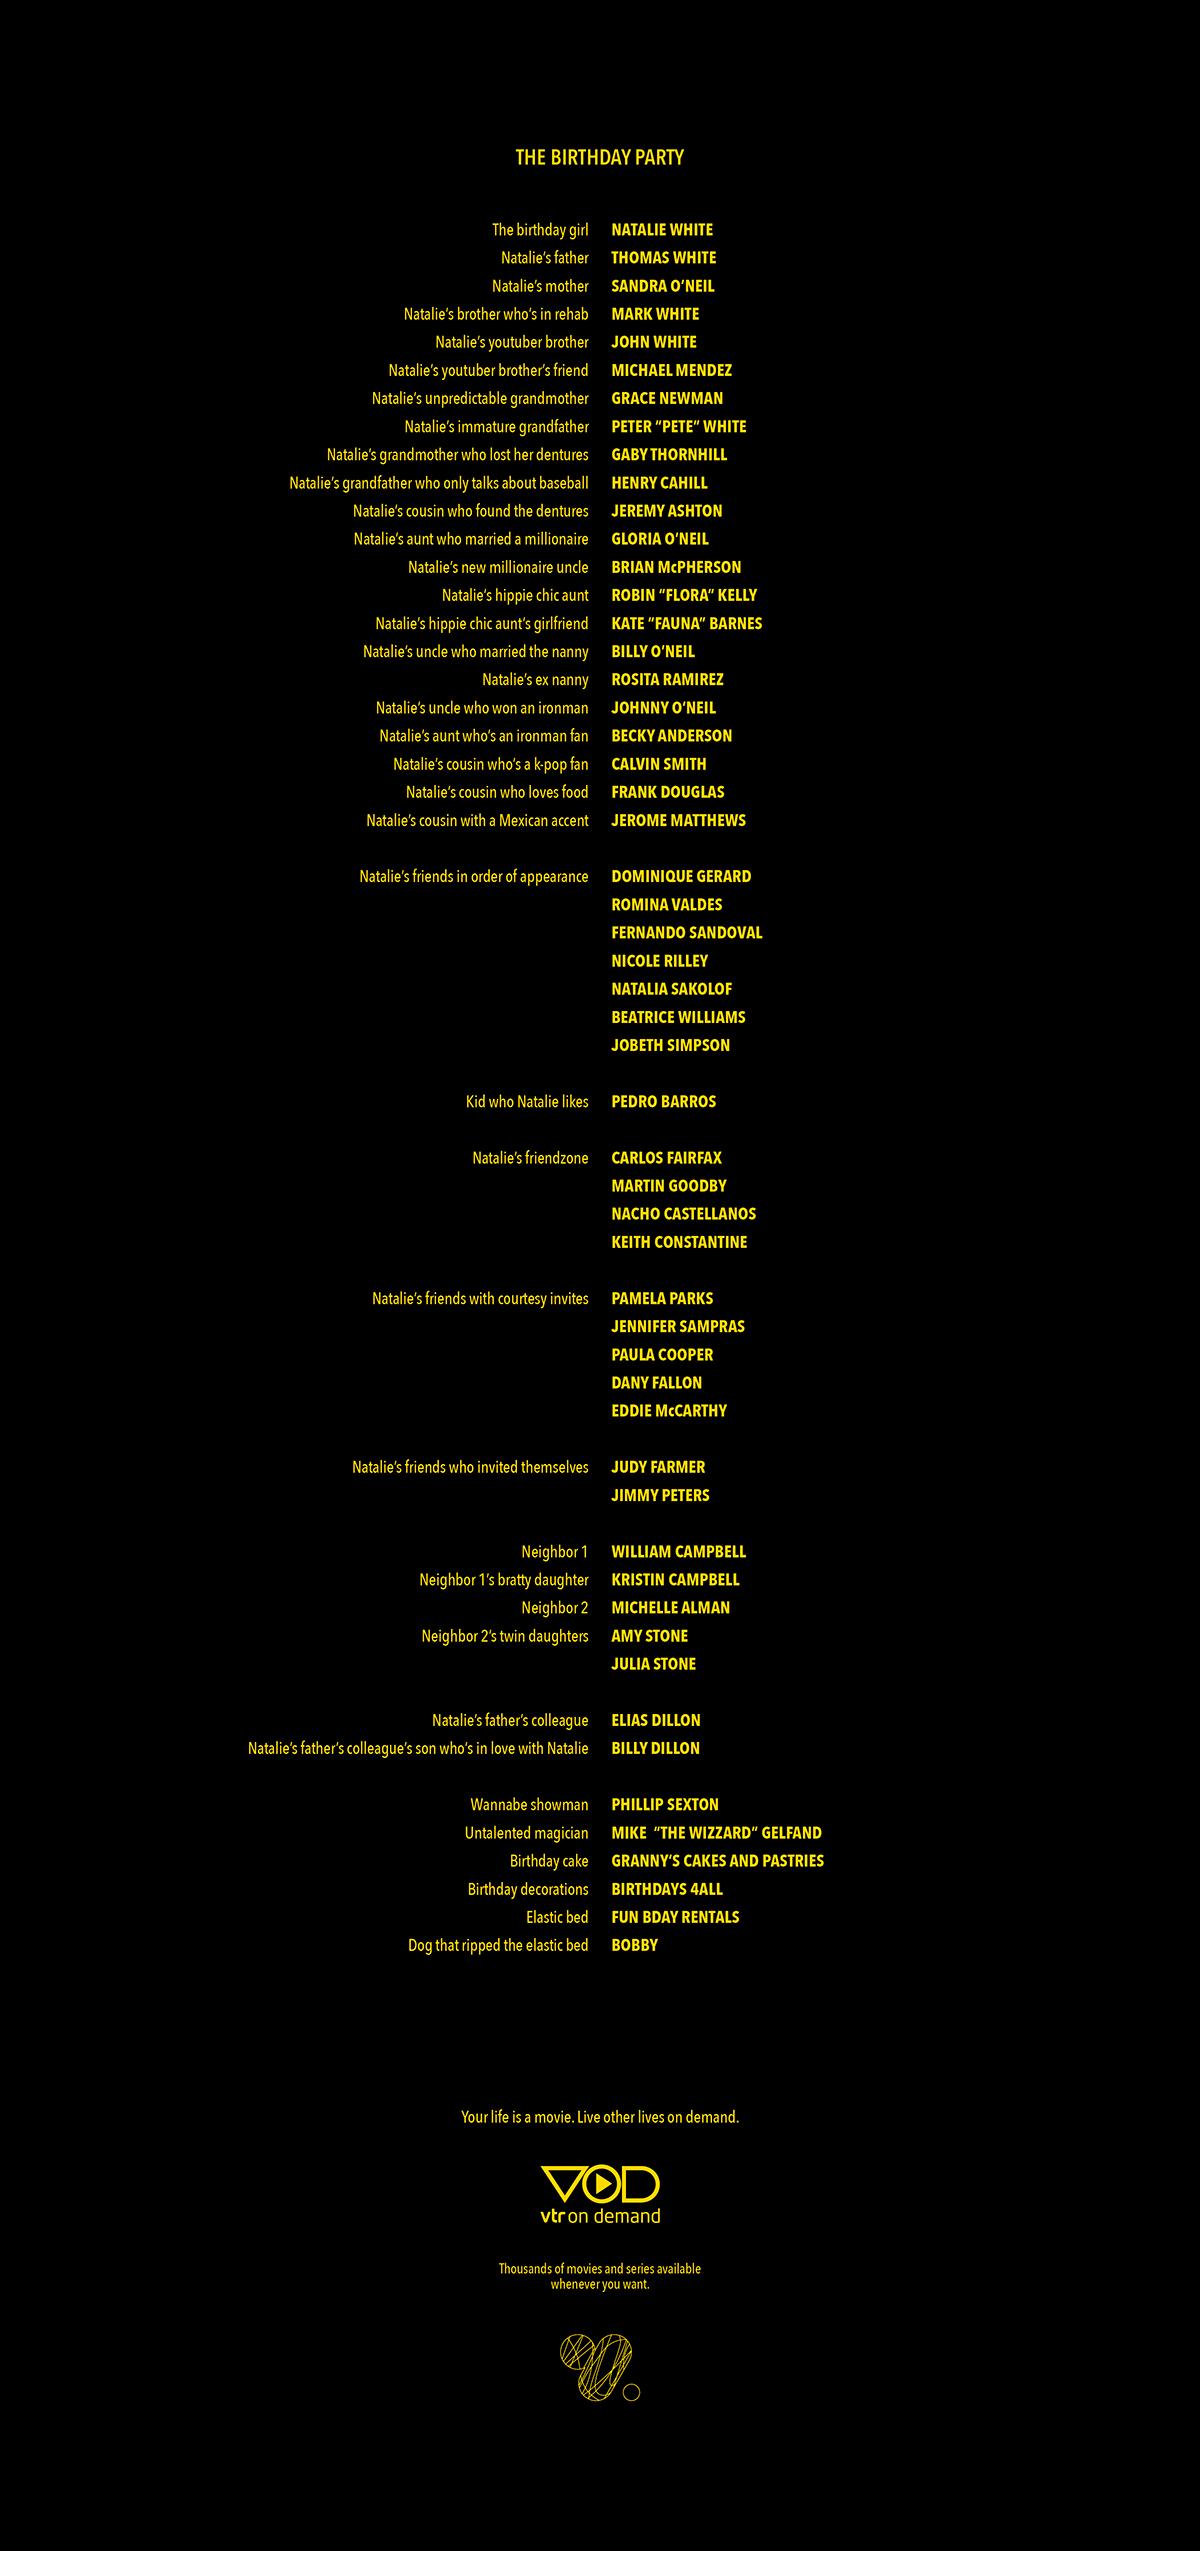 vtr - vod - film - credits - movie on behance  behance